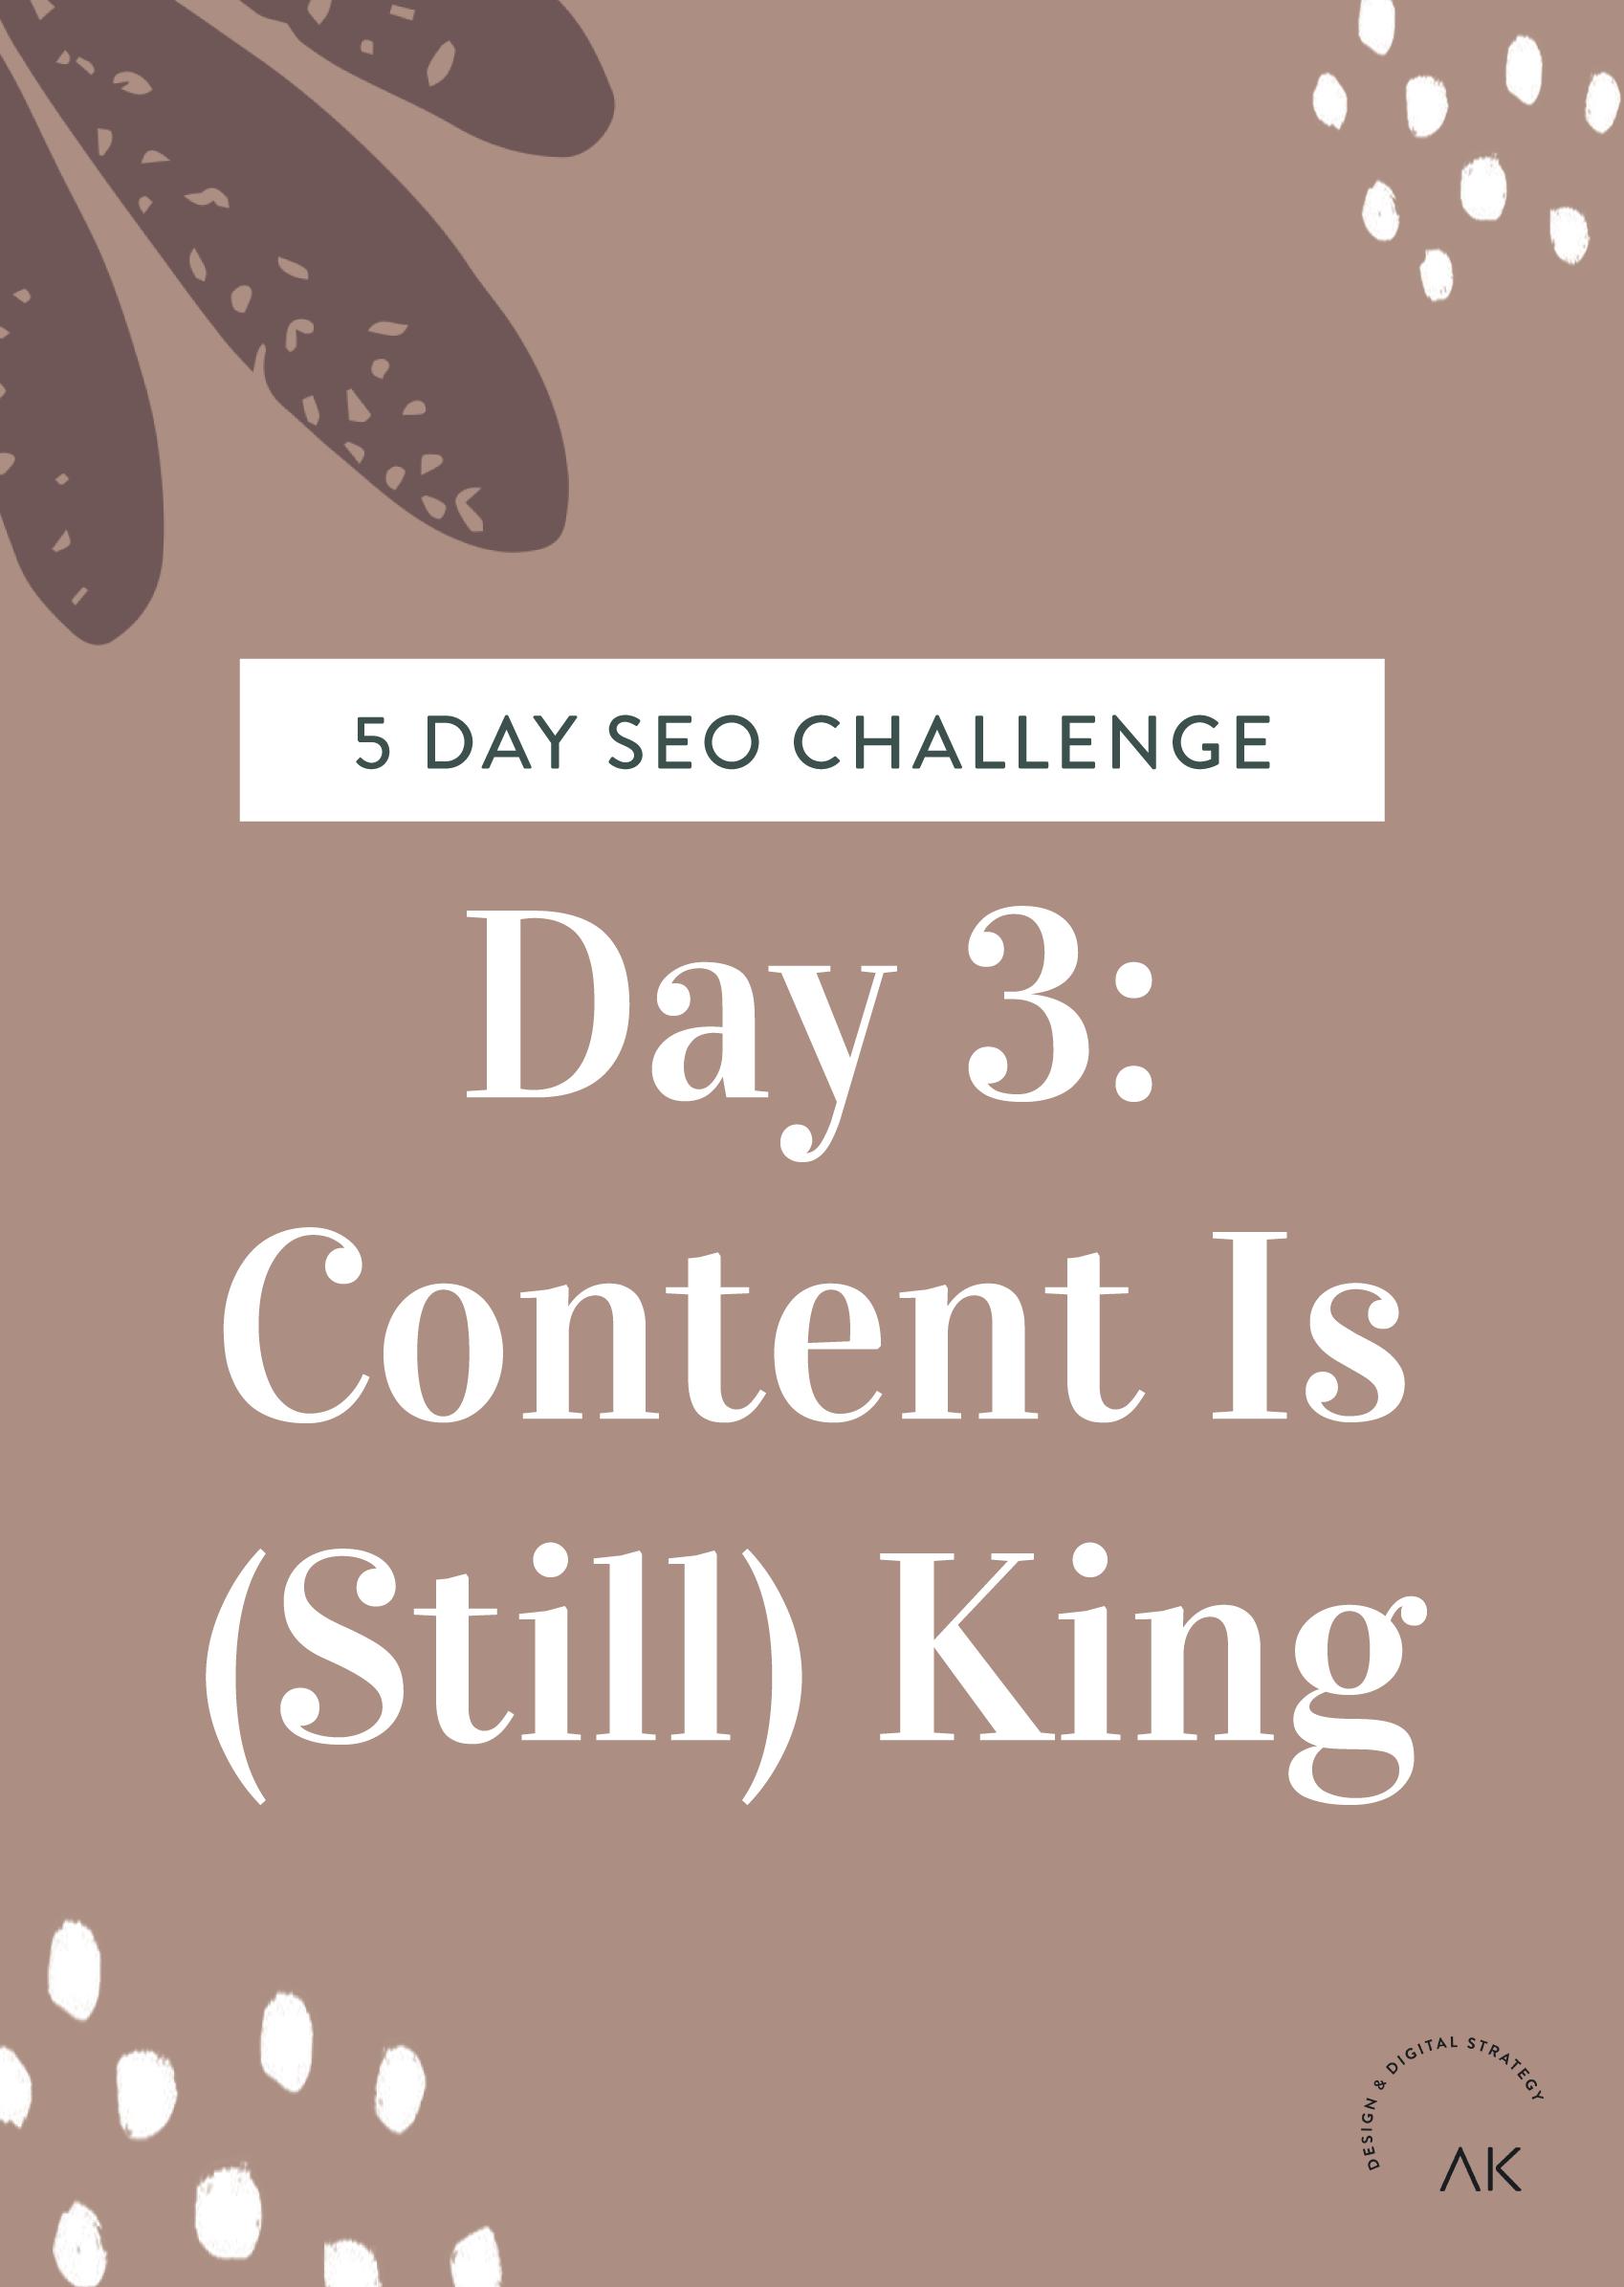 SEO Challenge Day 3